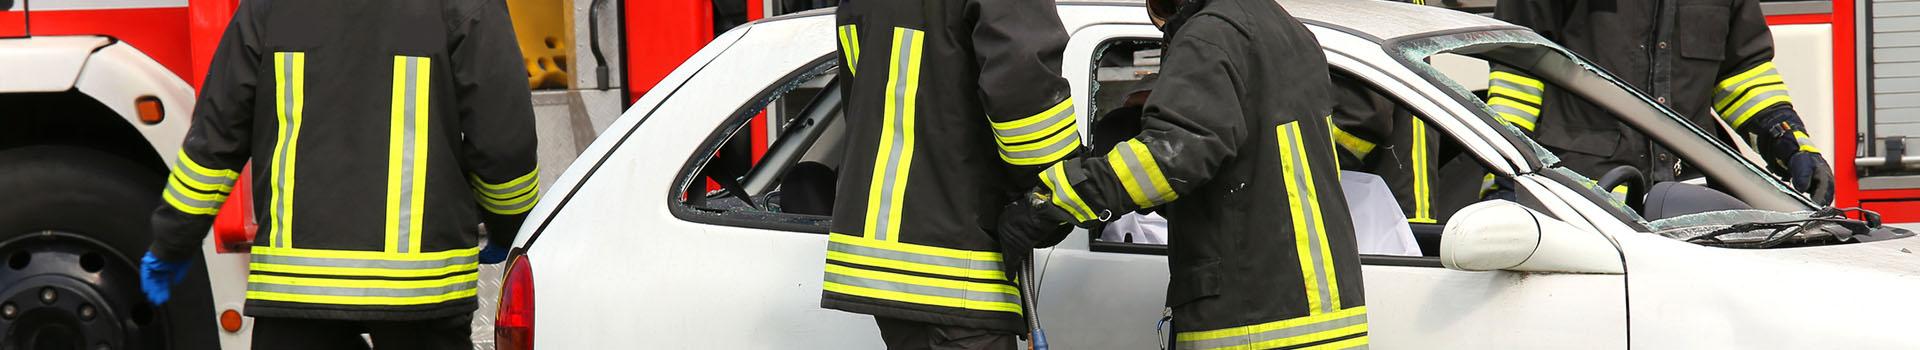 Road accident compensation Liverpool